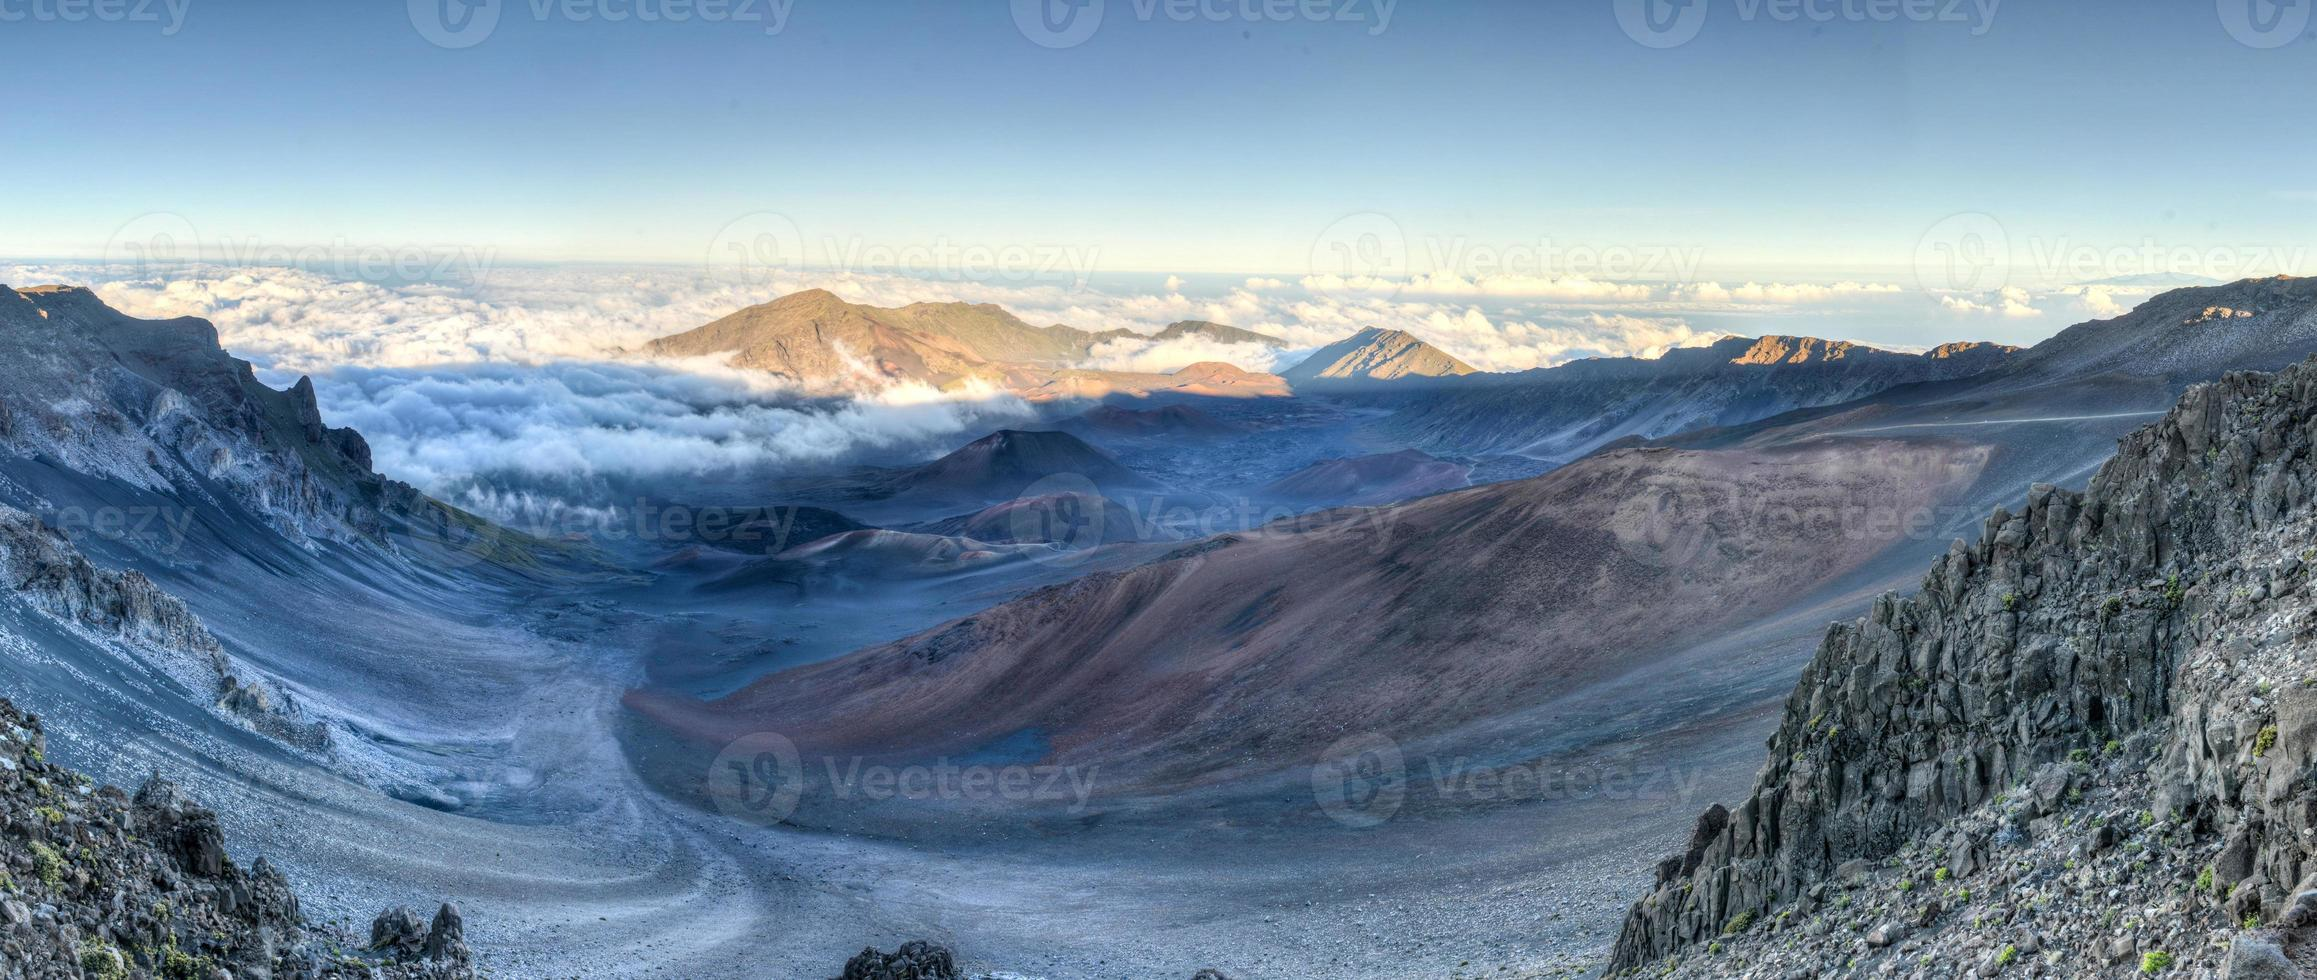 caldeira du volcan haleakala (maui, hawaï) photo